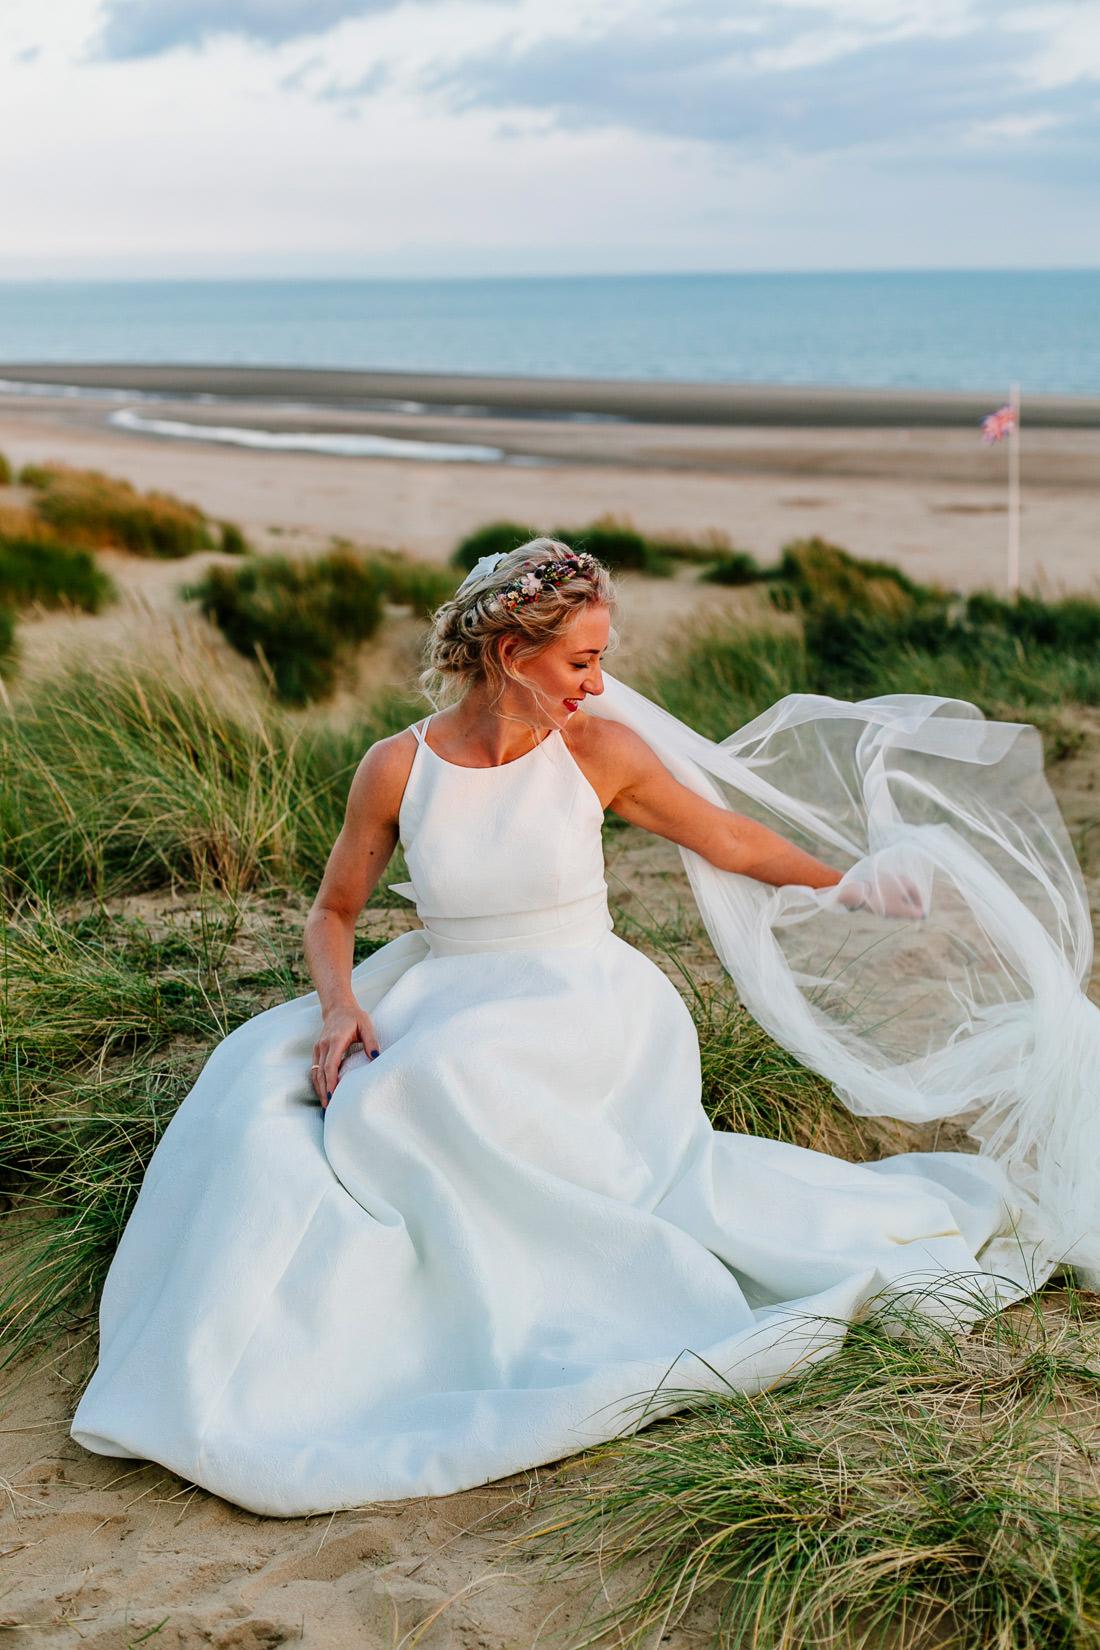 The-Gallivant-Camber-Sands-Beach-Kent-wedding-photographer-Epic-Love-Story-116